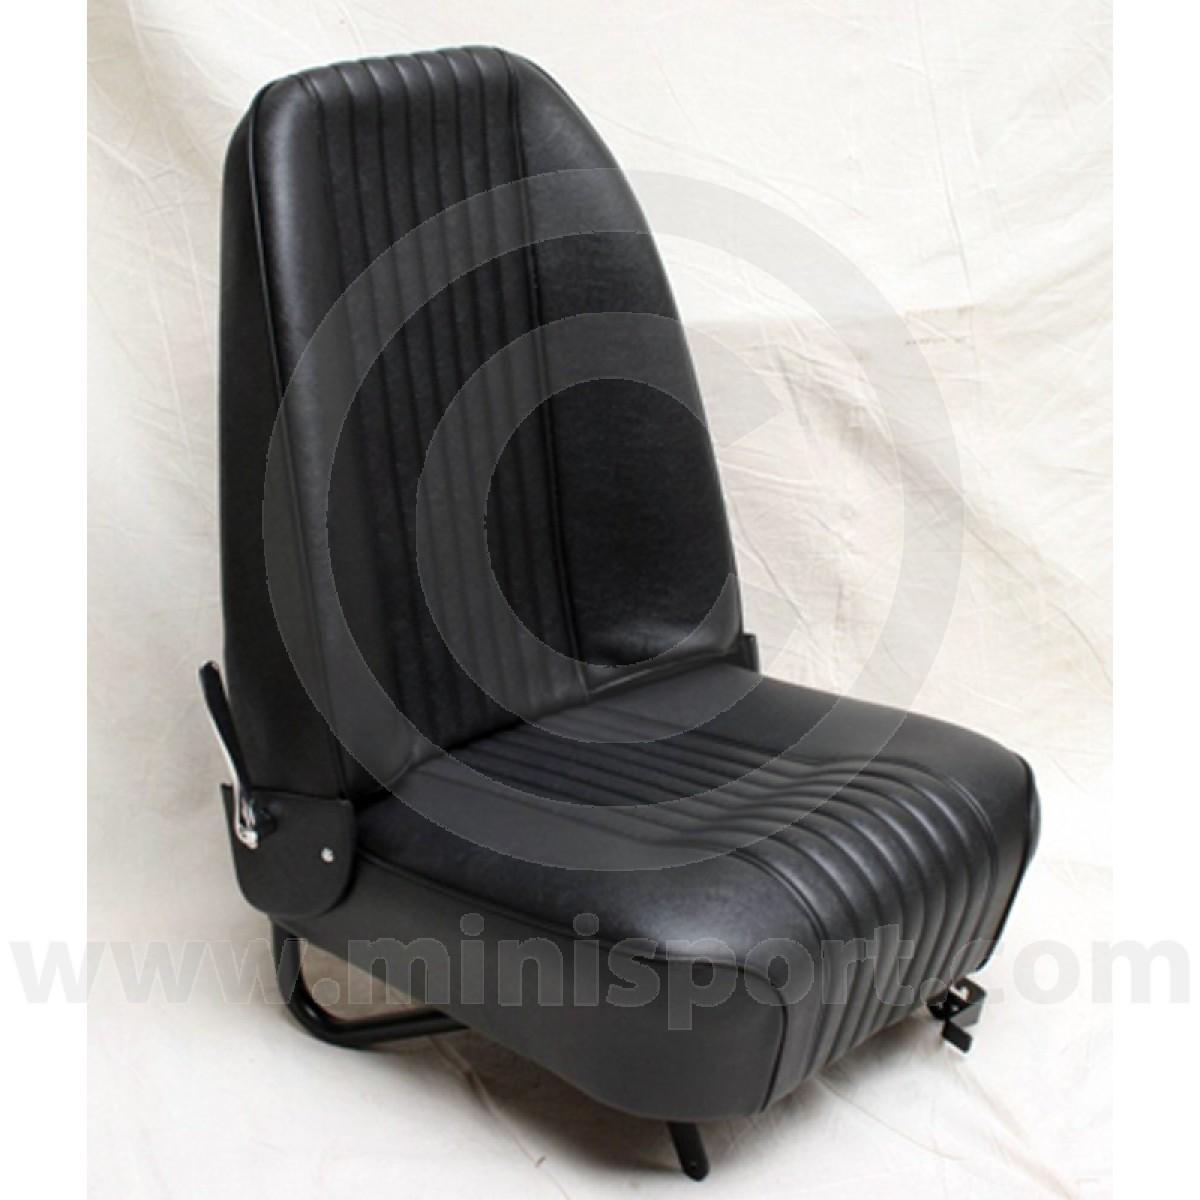 S3049 Mini Cooper Reclining Seat Interior Trim Front Wiring Diagram Mk2 67 70 Replica Rh